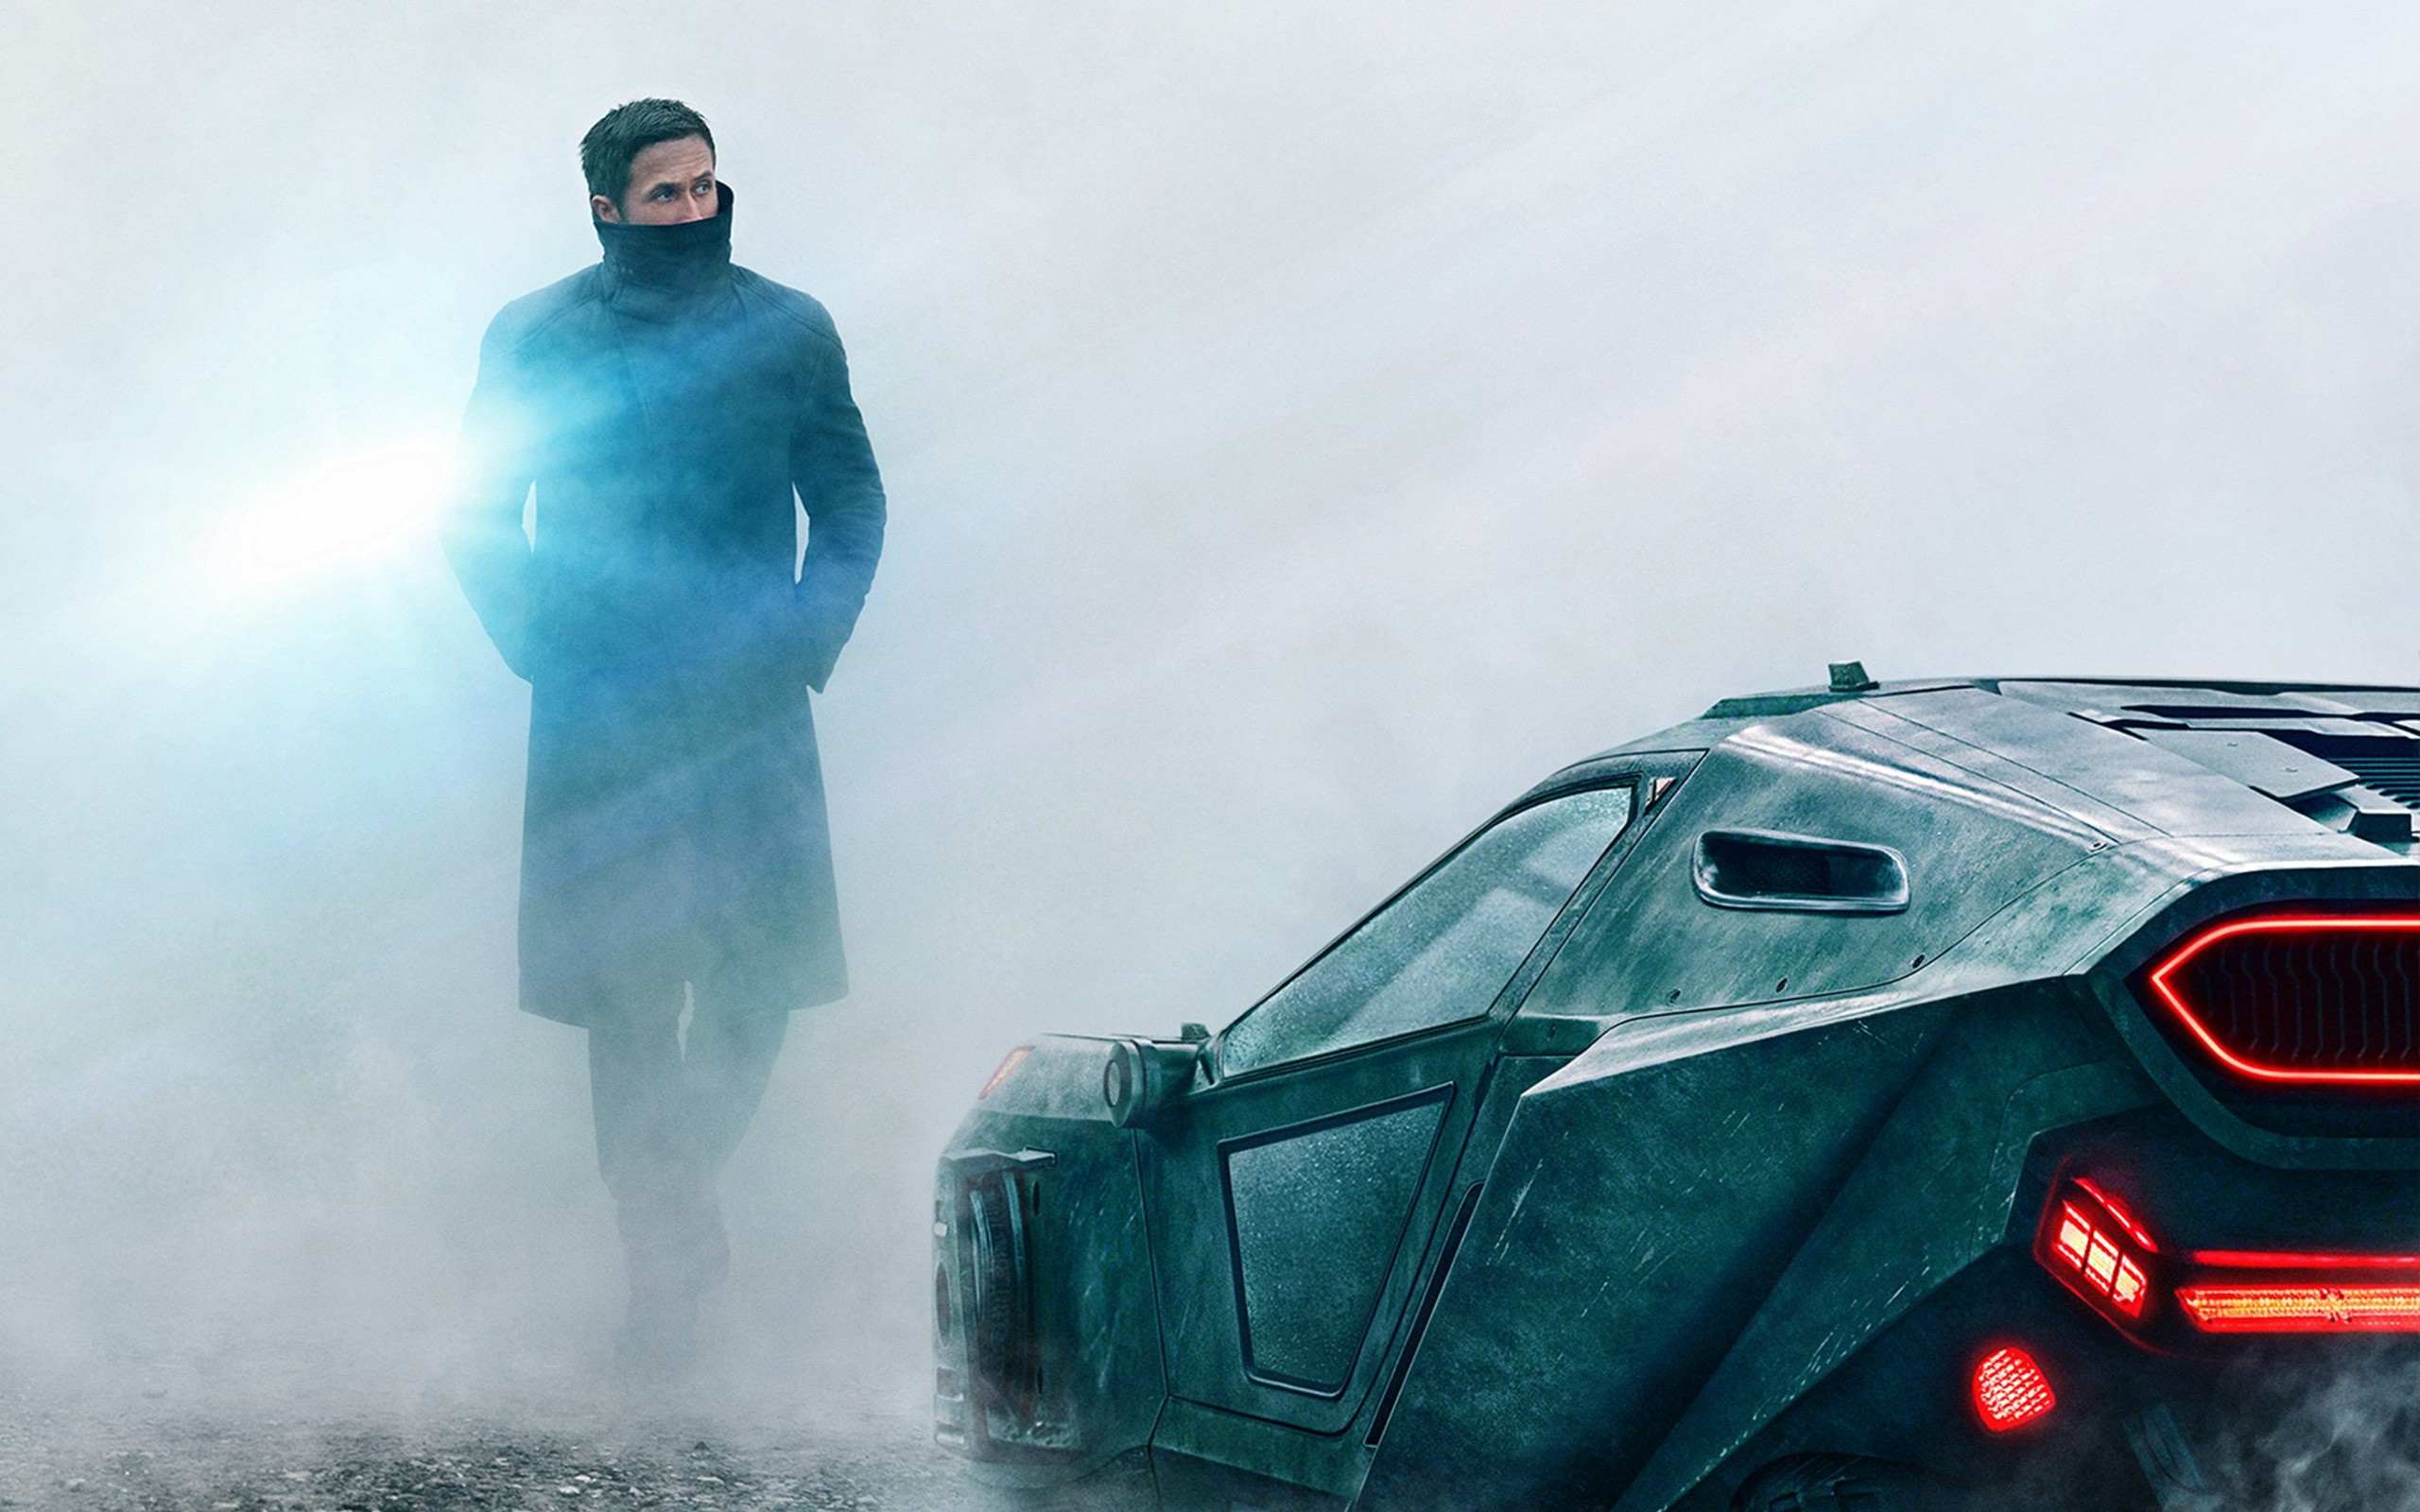 Blade Runner Wallpaper Download Free Full Hd Backgrounds For